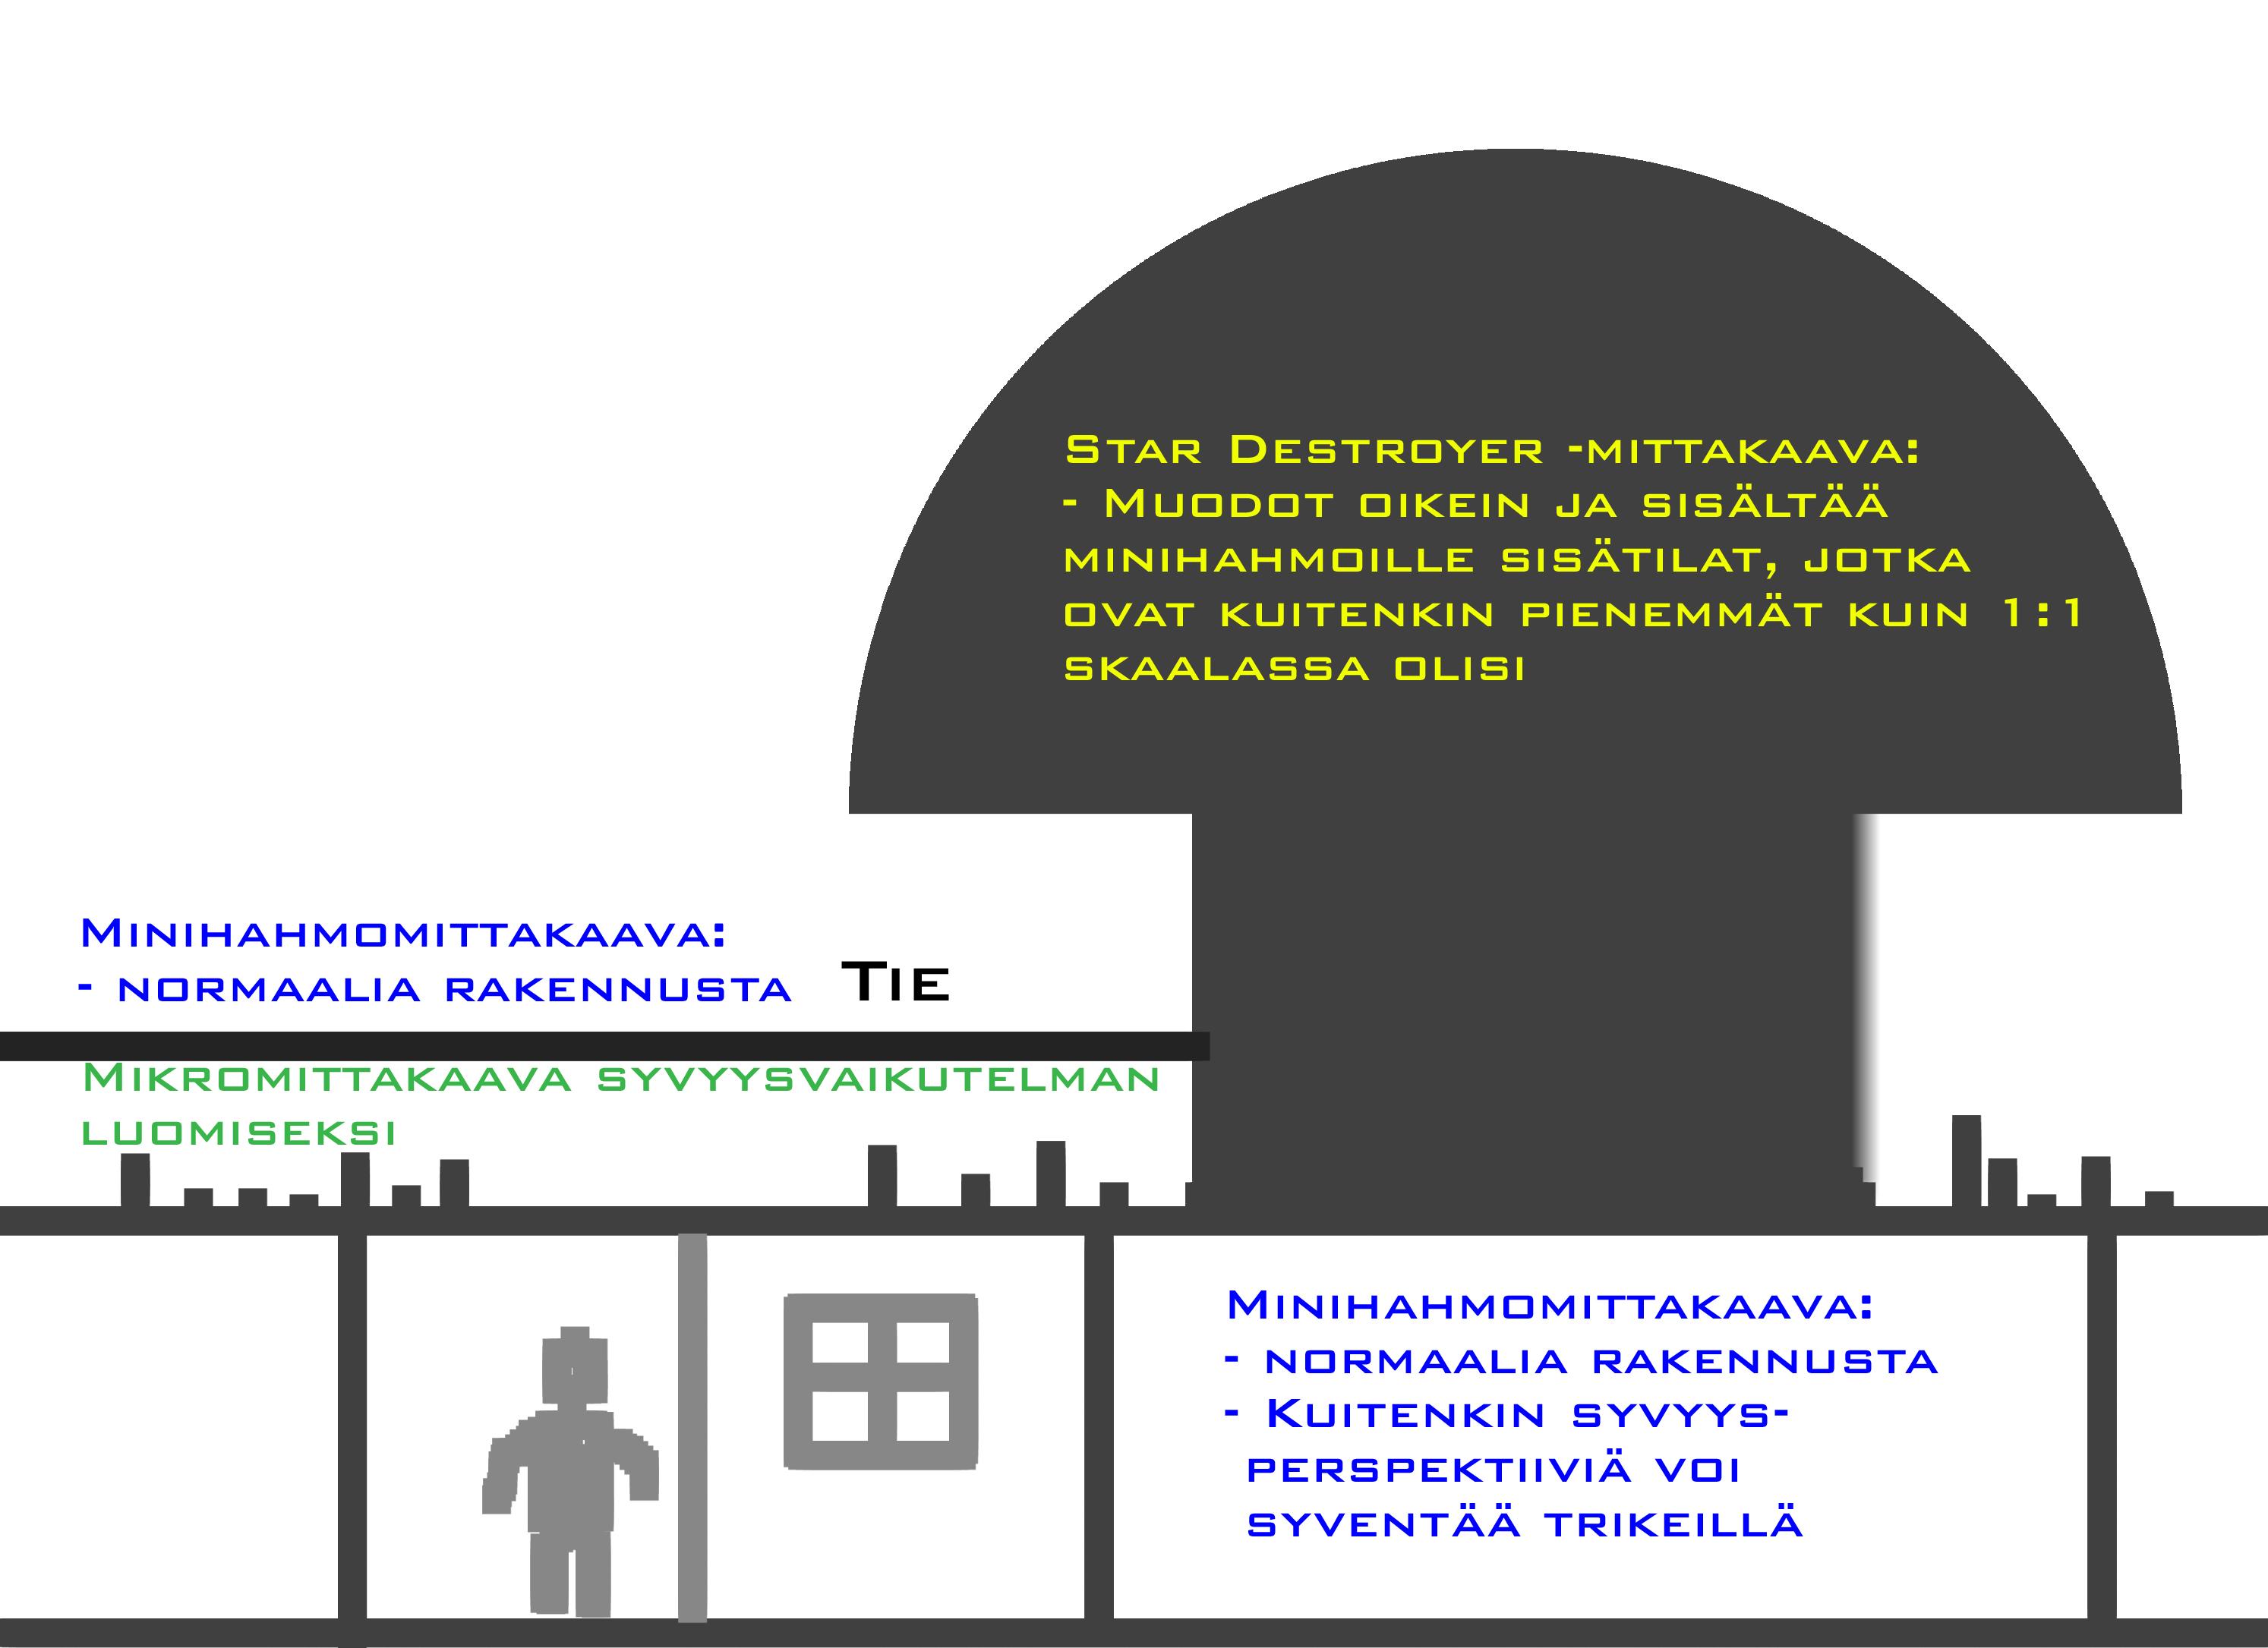 coruscant_side_pic_schematics.jpg